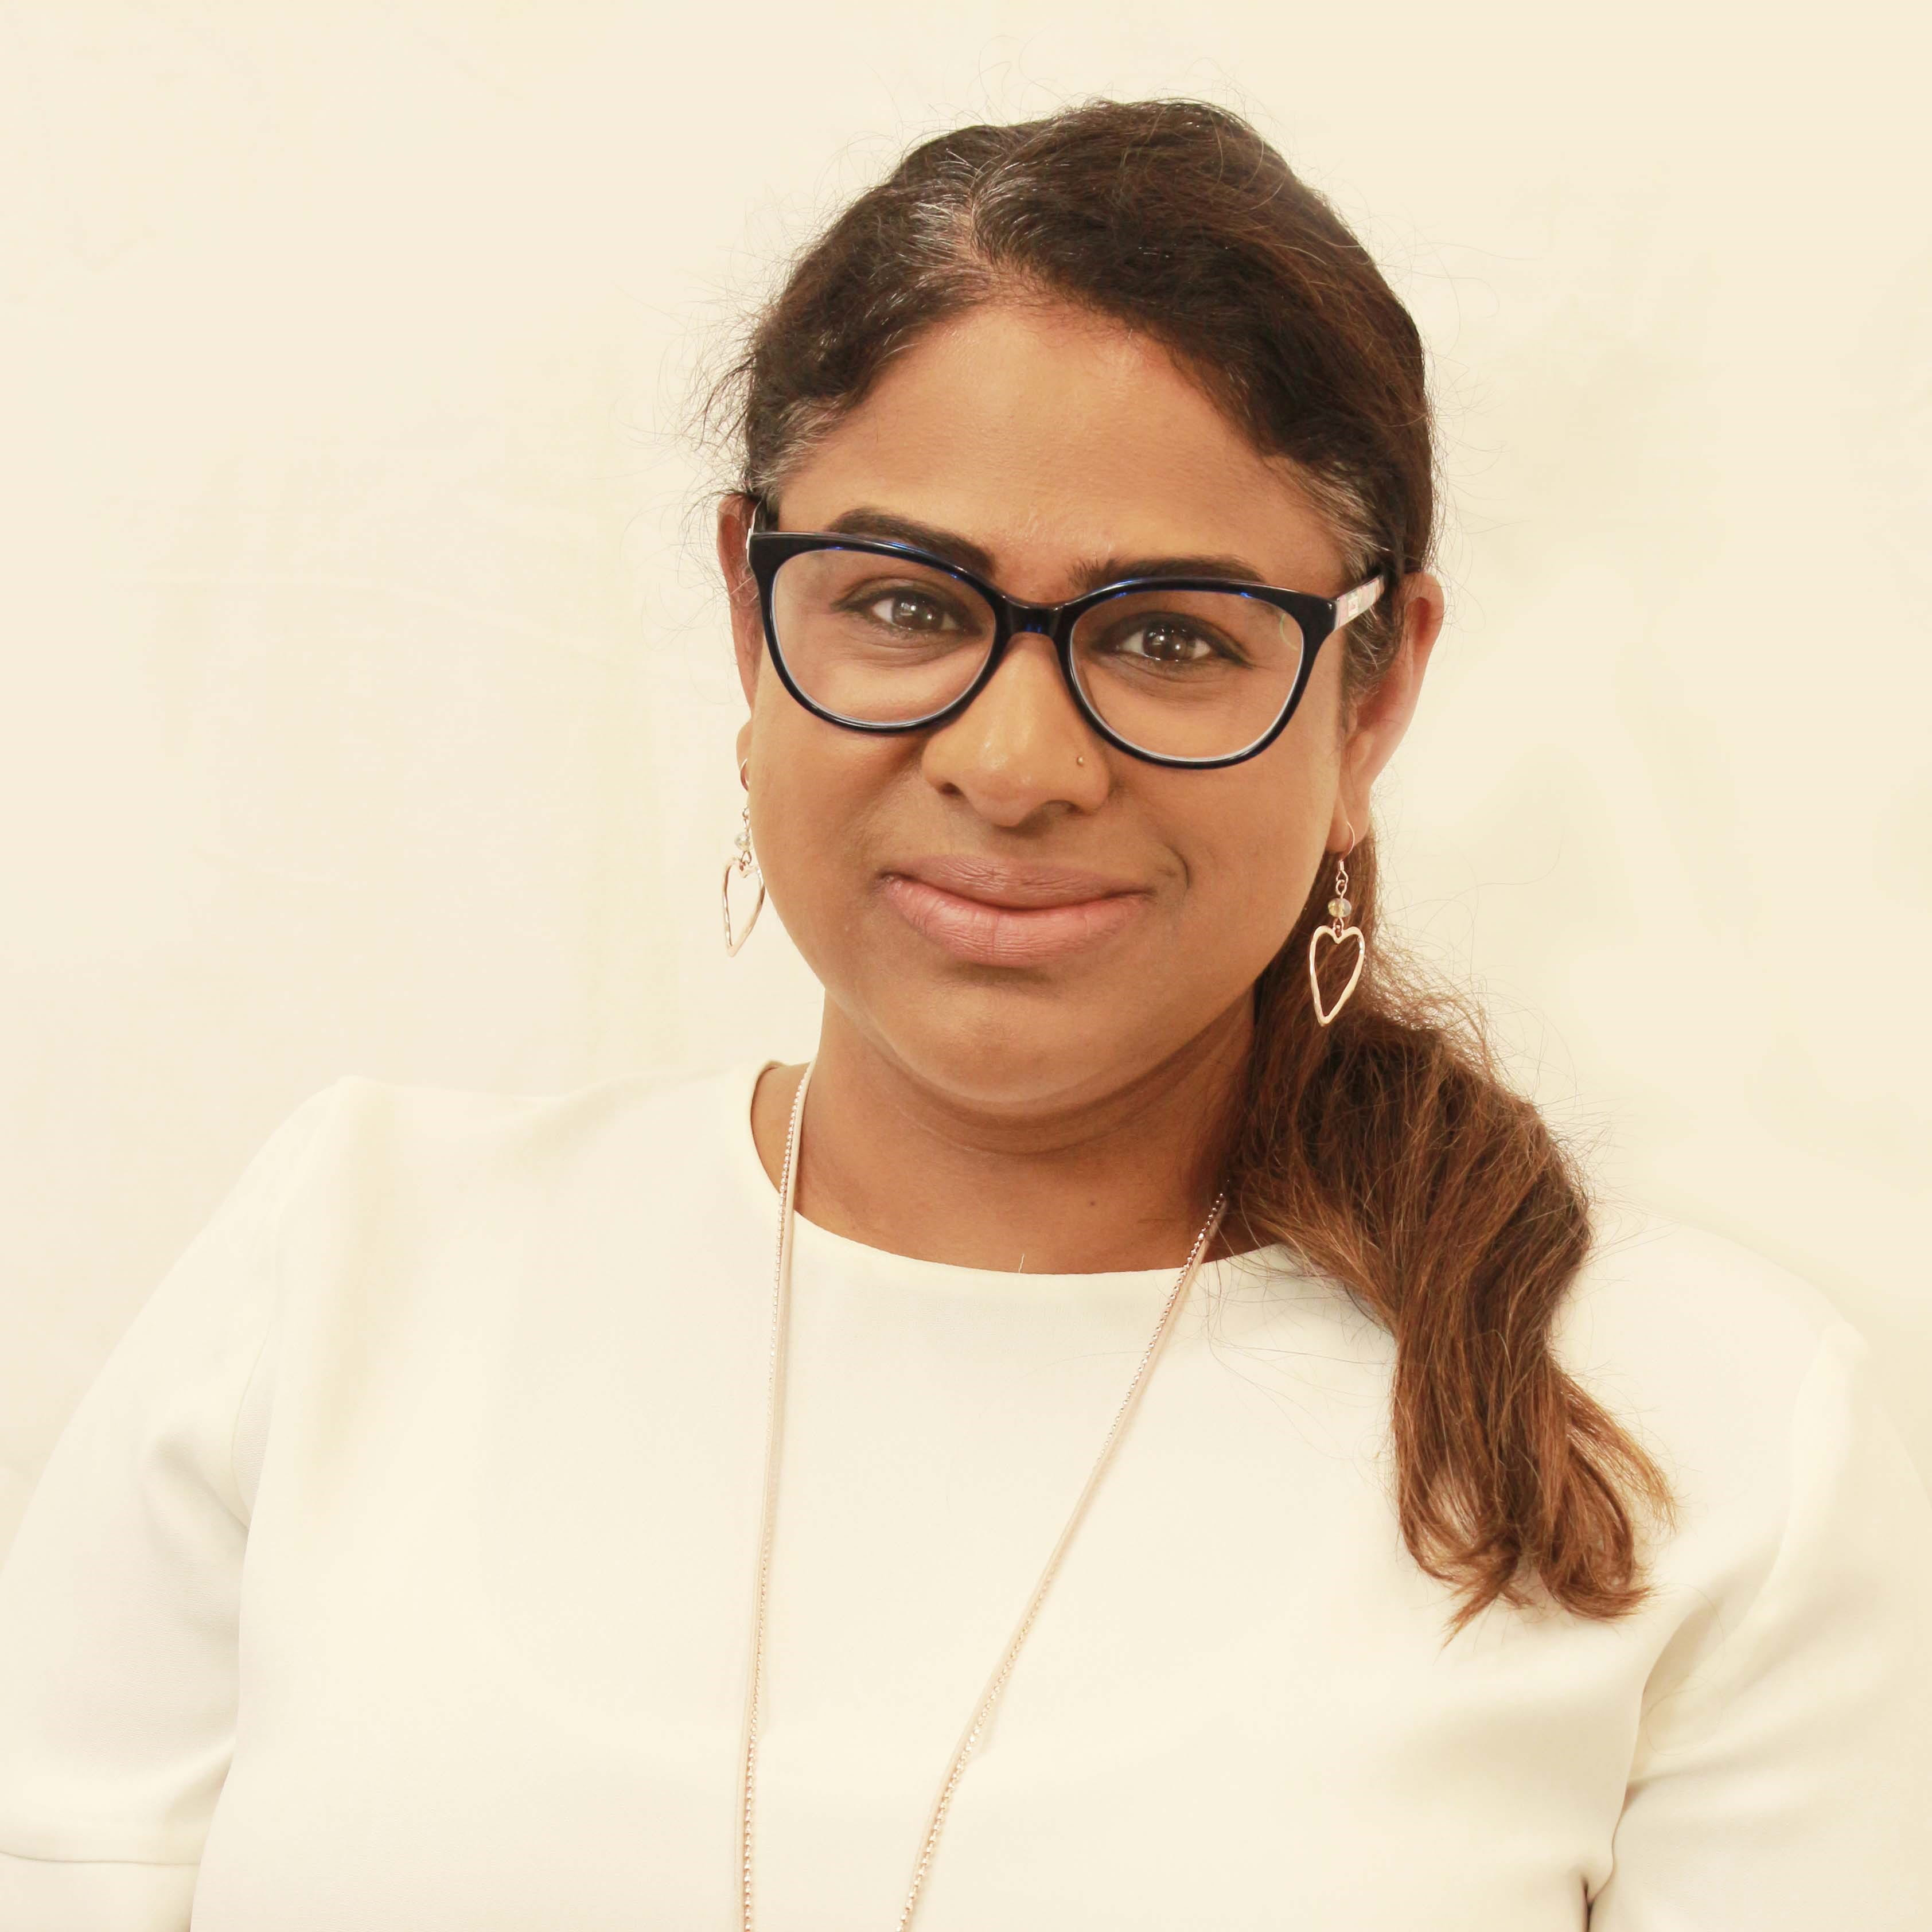 Nila Khan